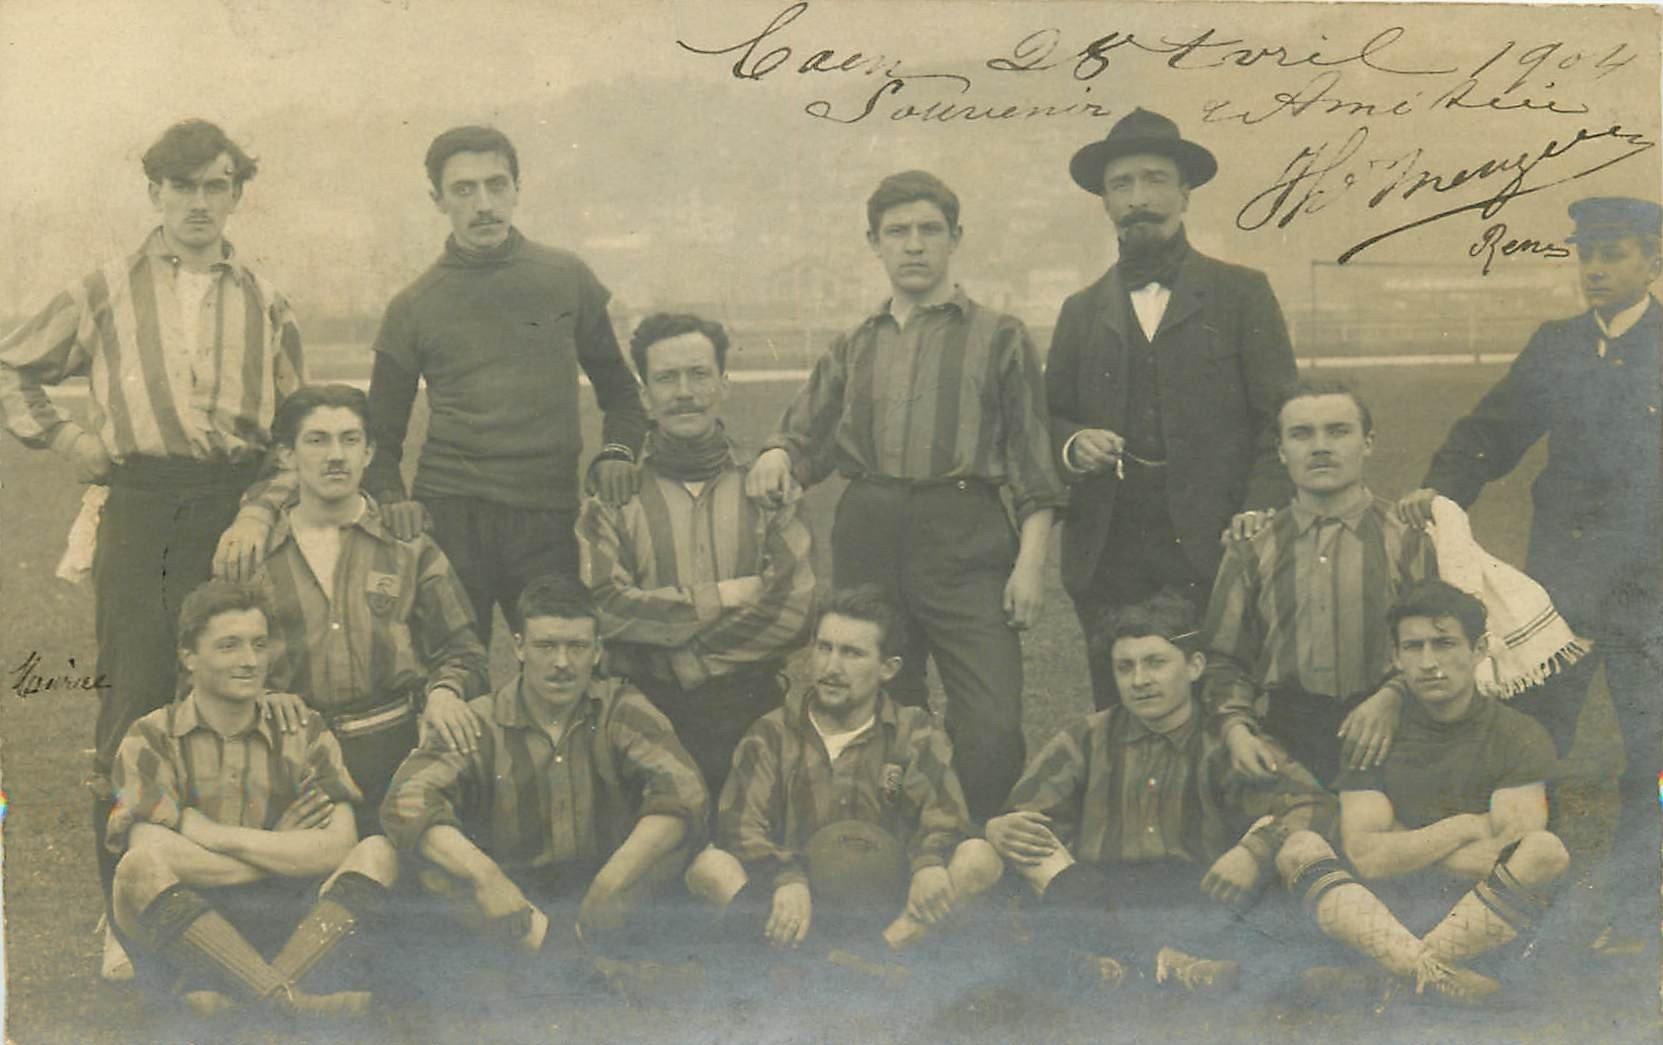 14 CAEN. L'Equipe de Football en 1904. Photo carte postale ancienne